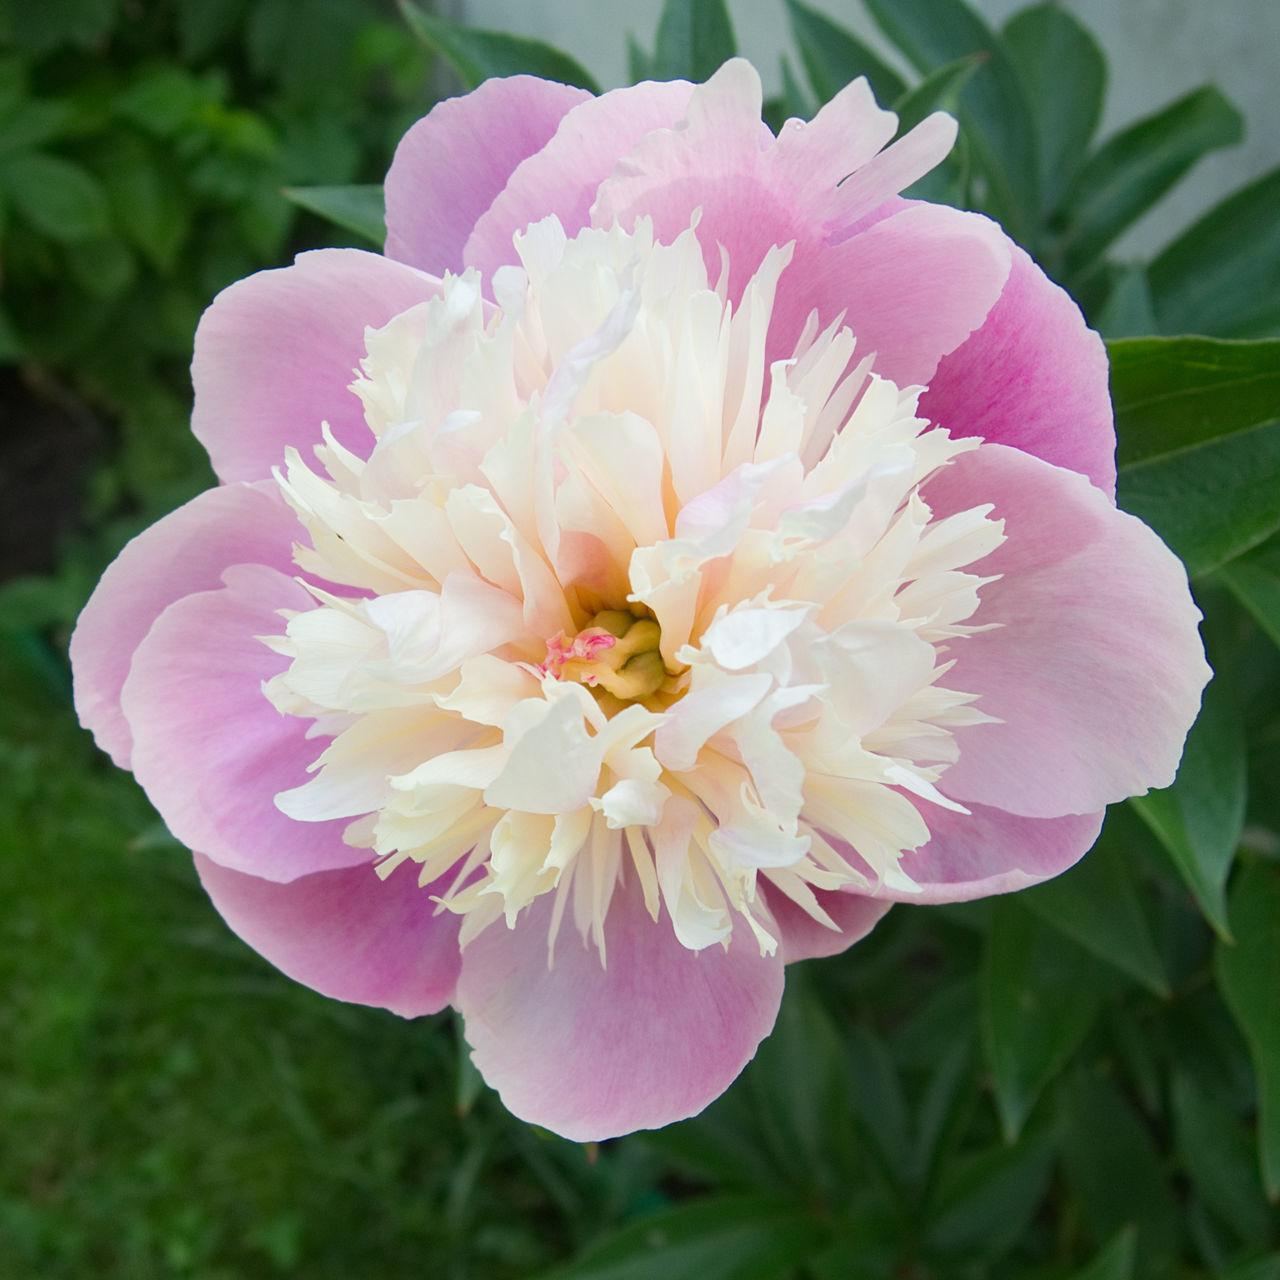 Pfingstrose Flower Flower Head Flowers Flowers,Plants & Garden Blooming Bloom Springtime Peony  PeonyBloom Peony Flower Garden